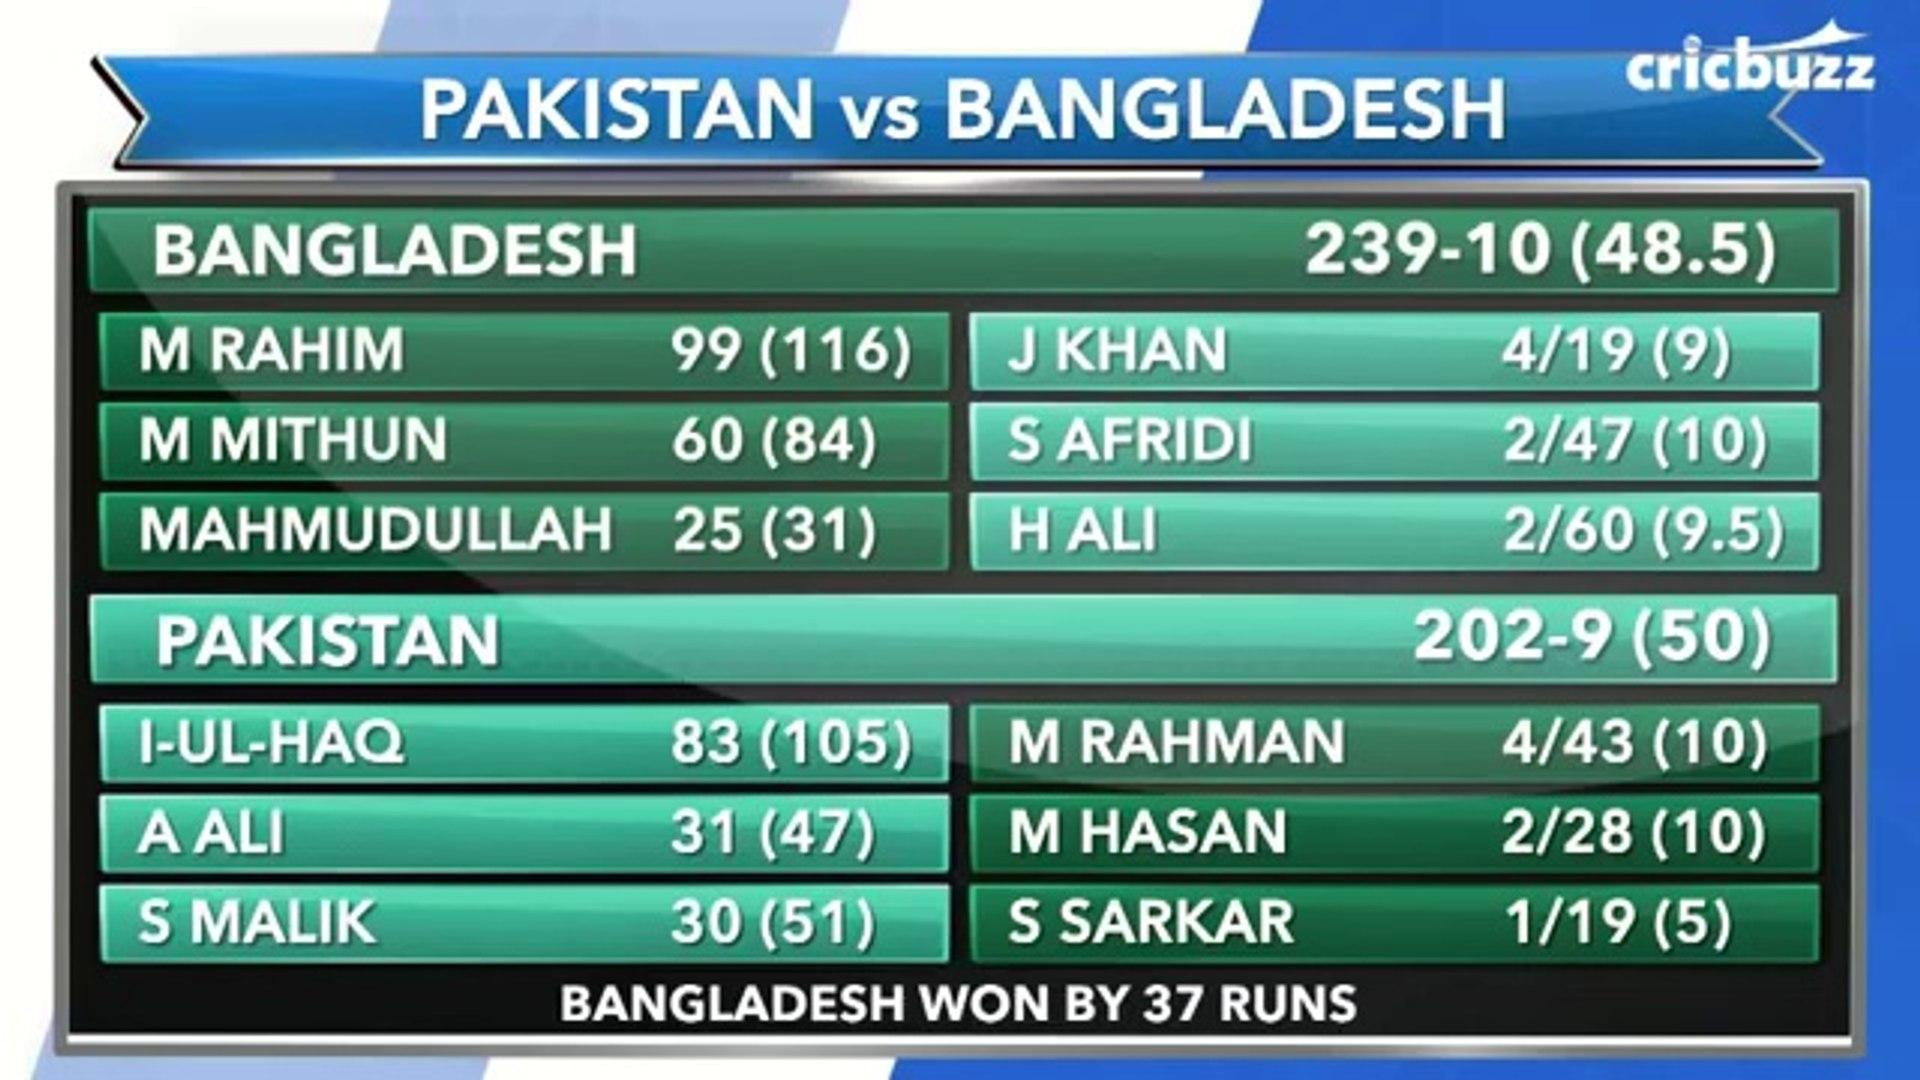 Pakistan vs Bangladesh | Highlights & Analysis | Bangladesh into the Finals